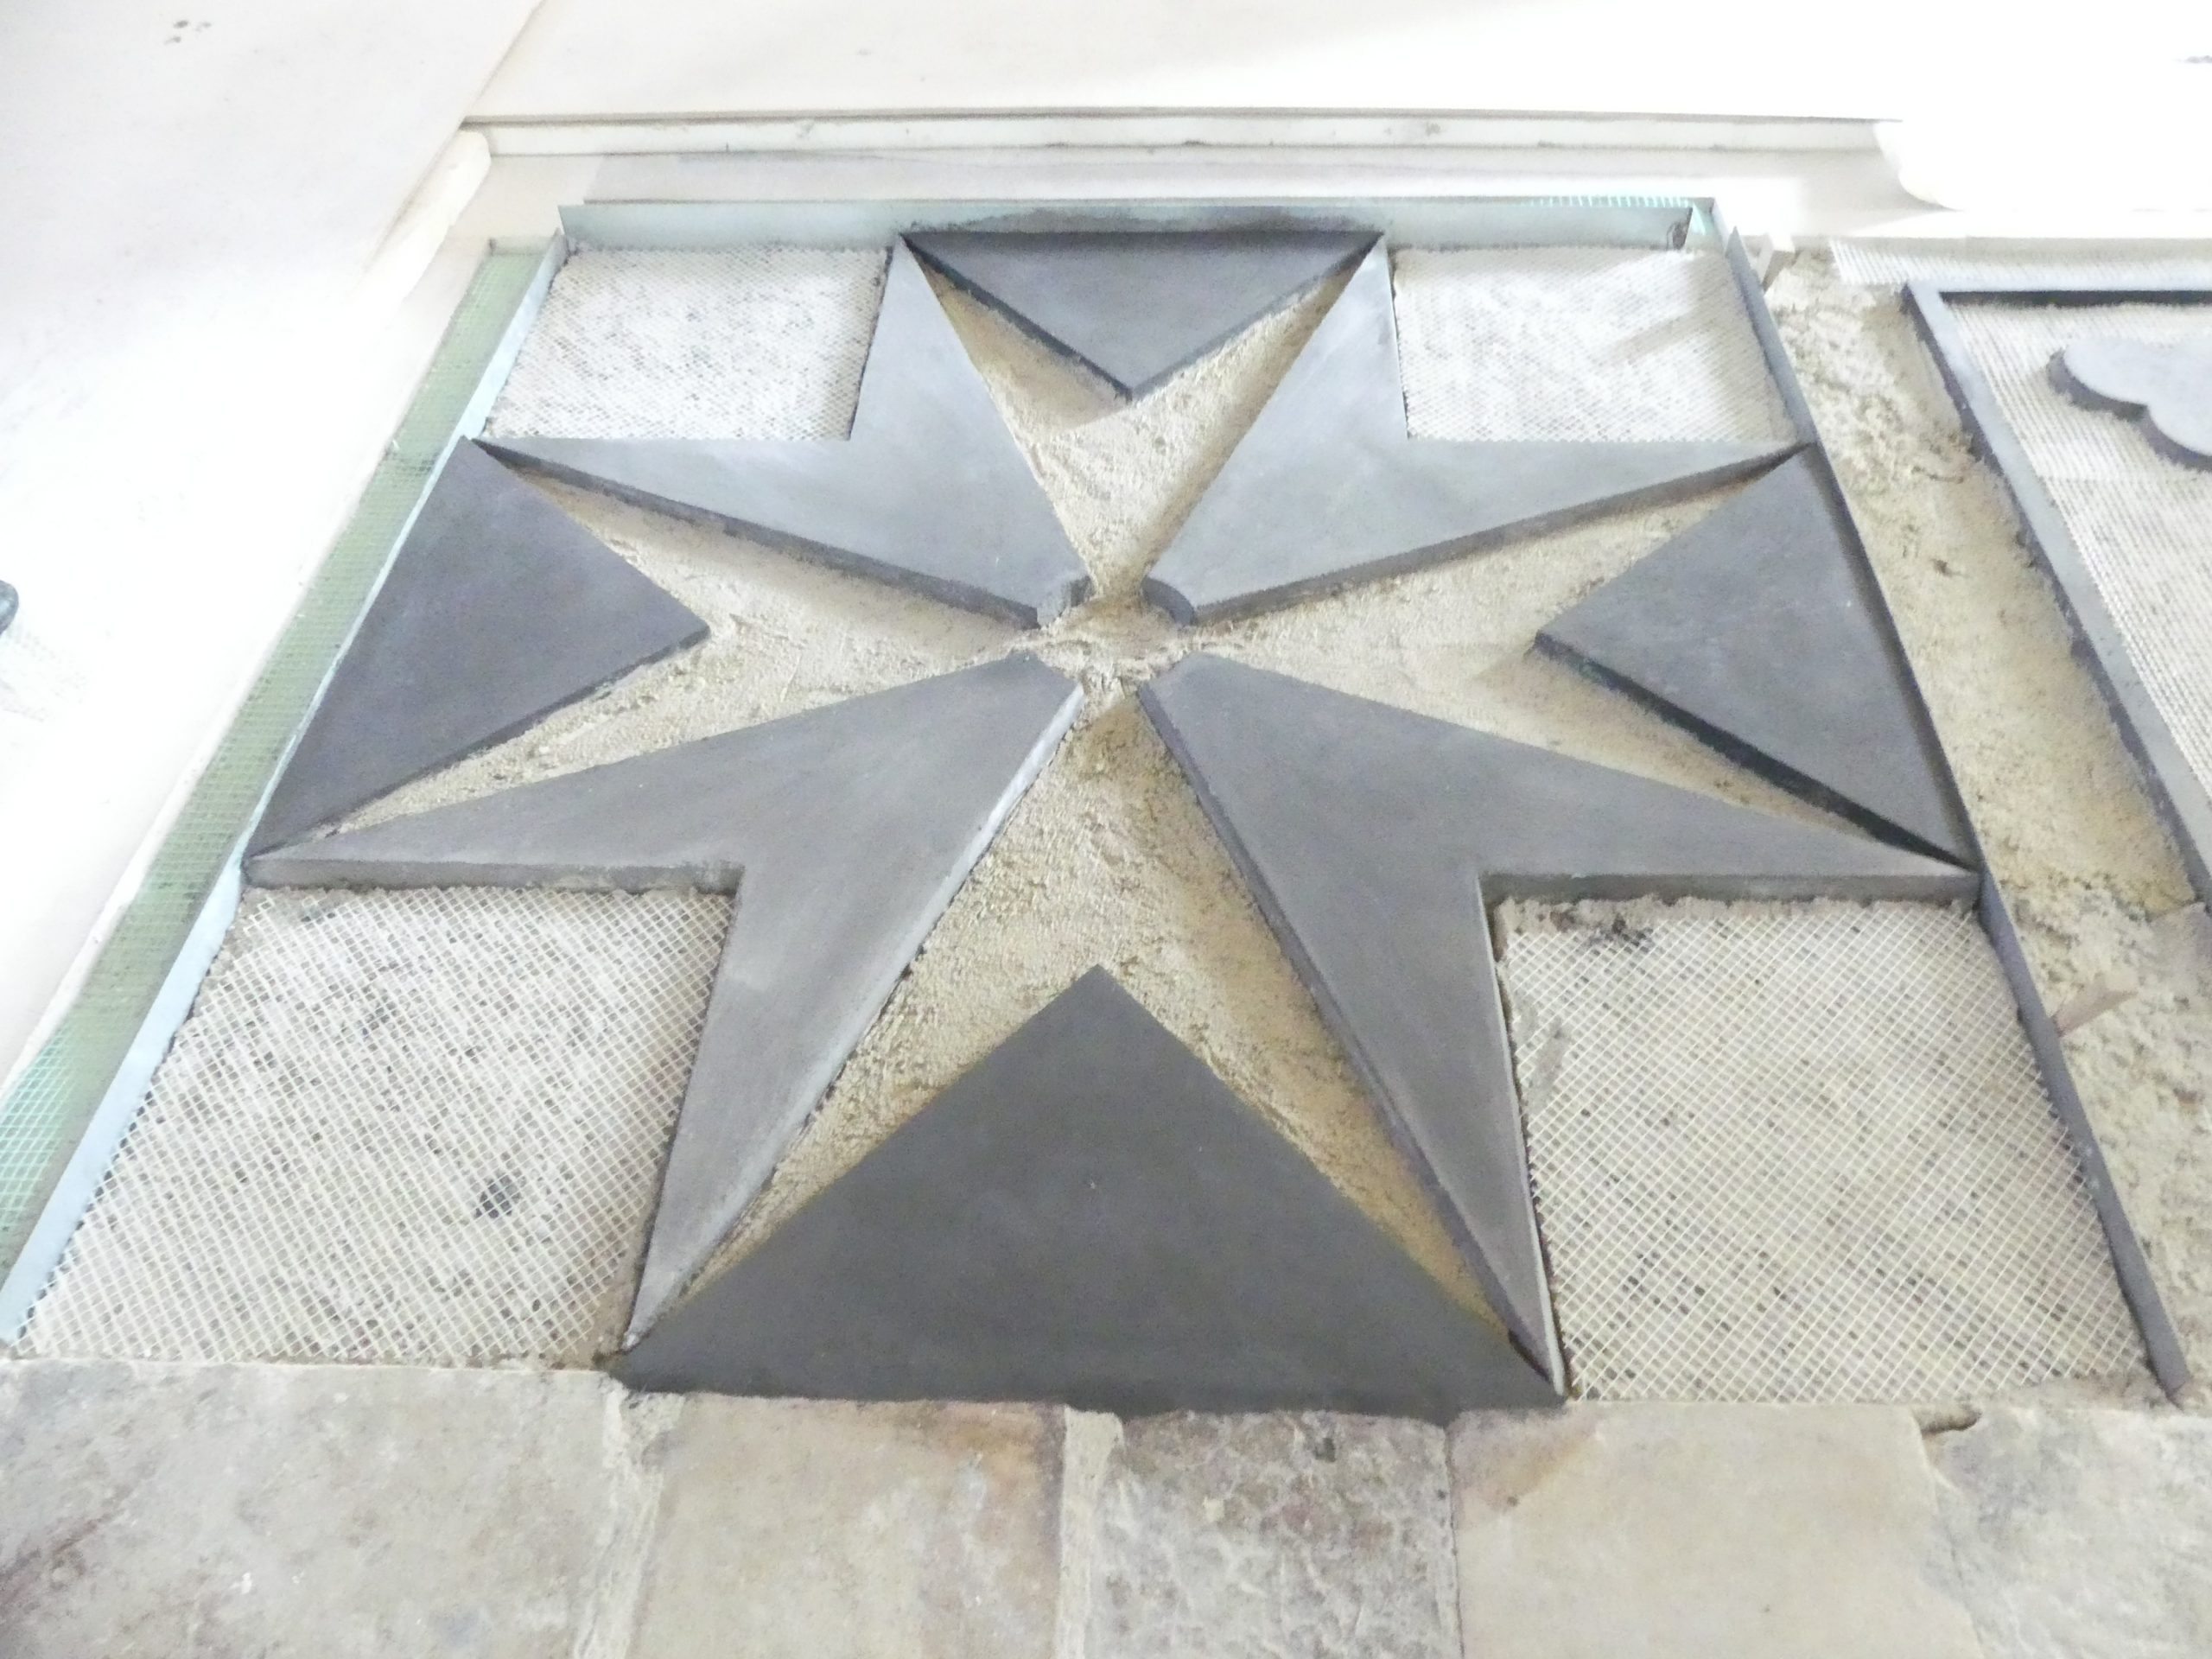 Ars - Eglise - Sol - Croix de Malte - 28 novembre 2019